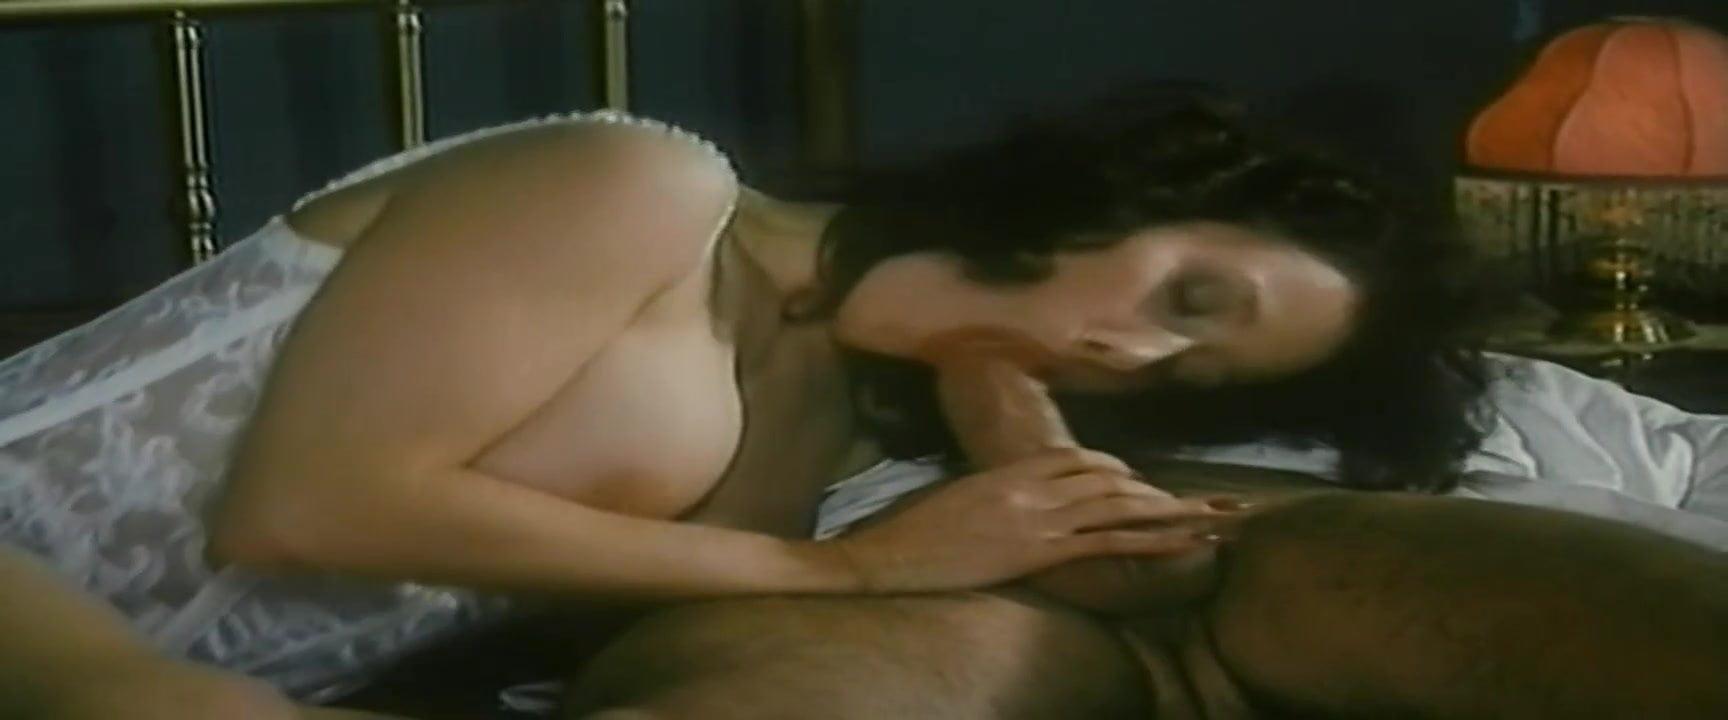 paprika porno